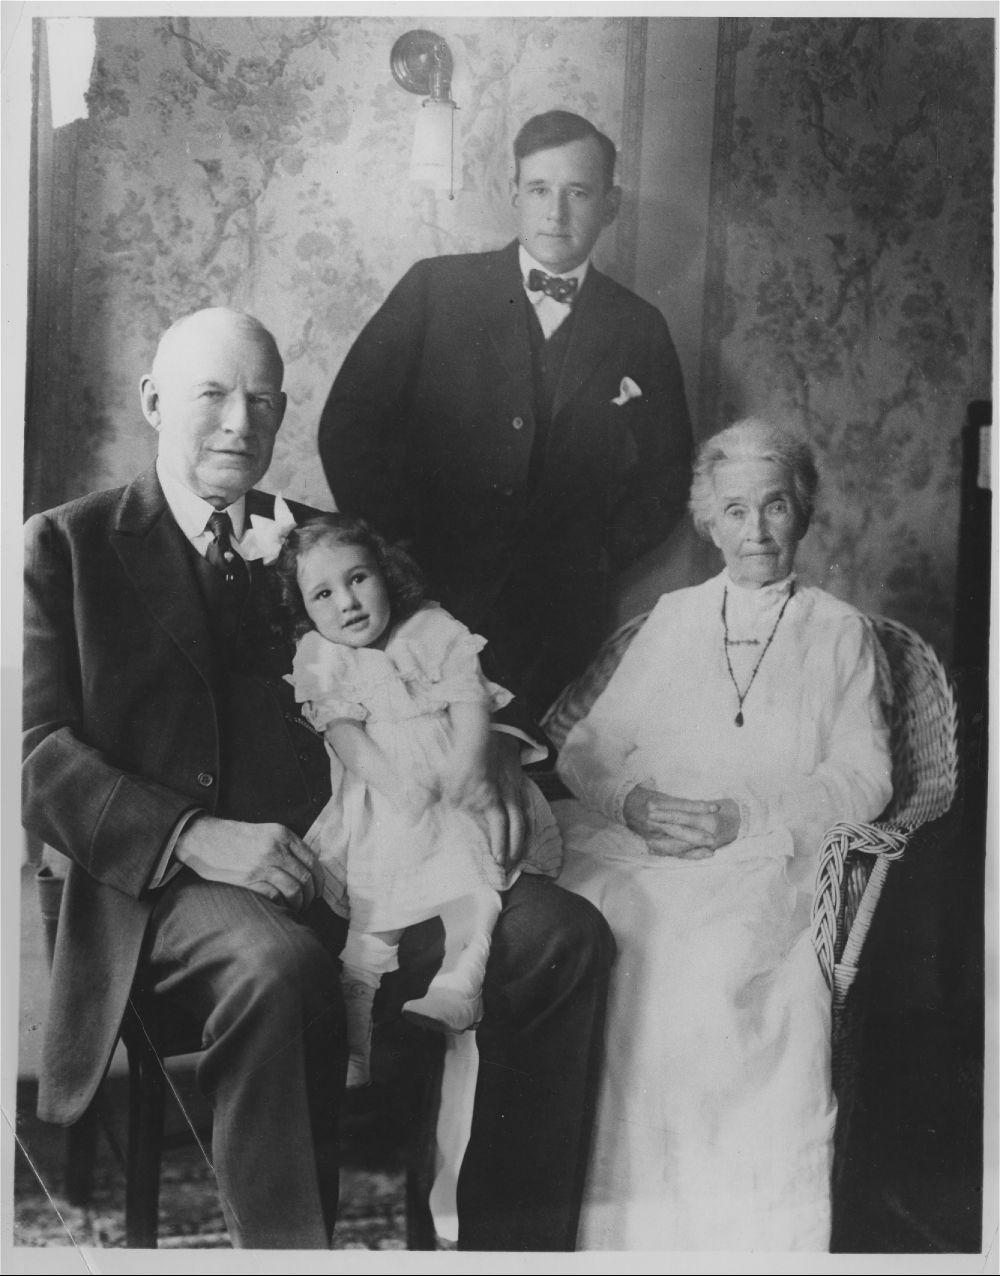 Four generations of Landons